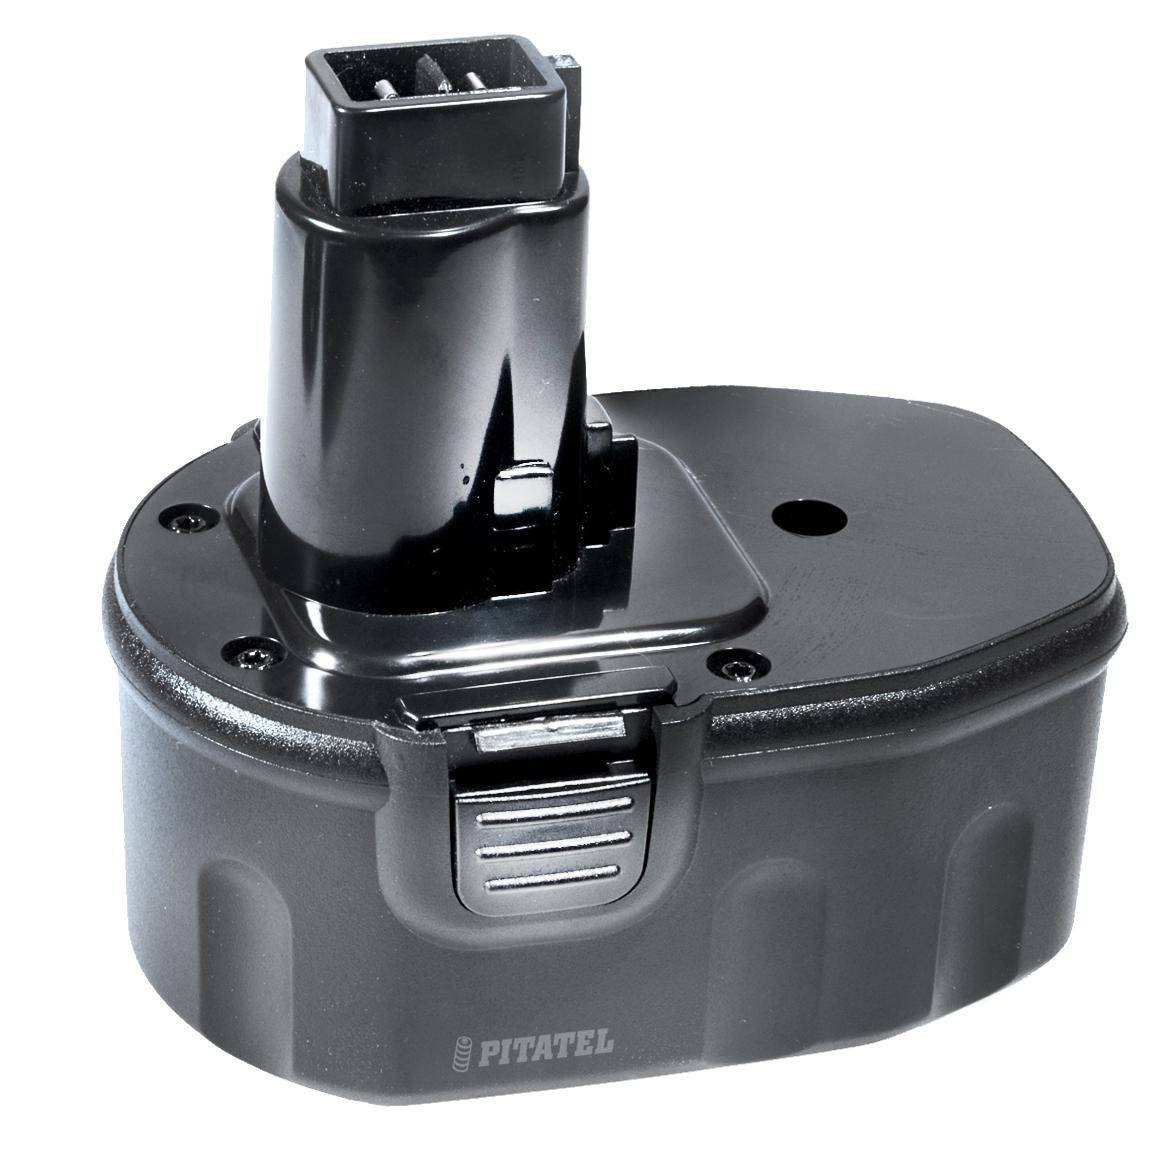 купить Аккумулятор Pitatel Tsb-022-de14/bd14a-33m по цене 3509 рублей